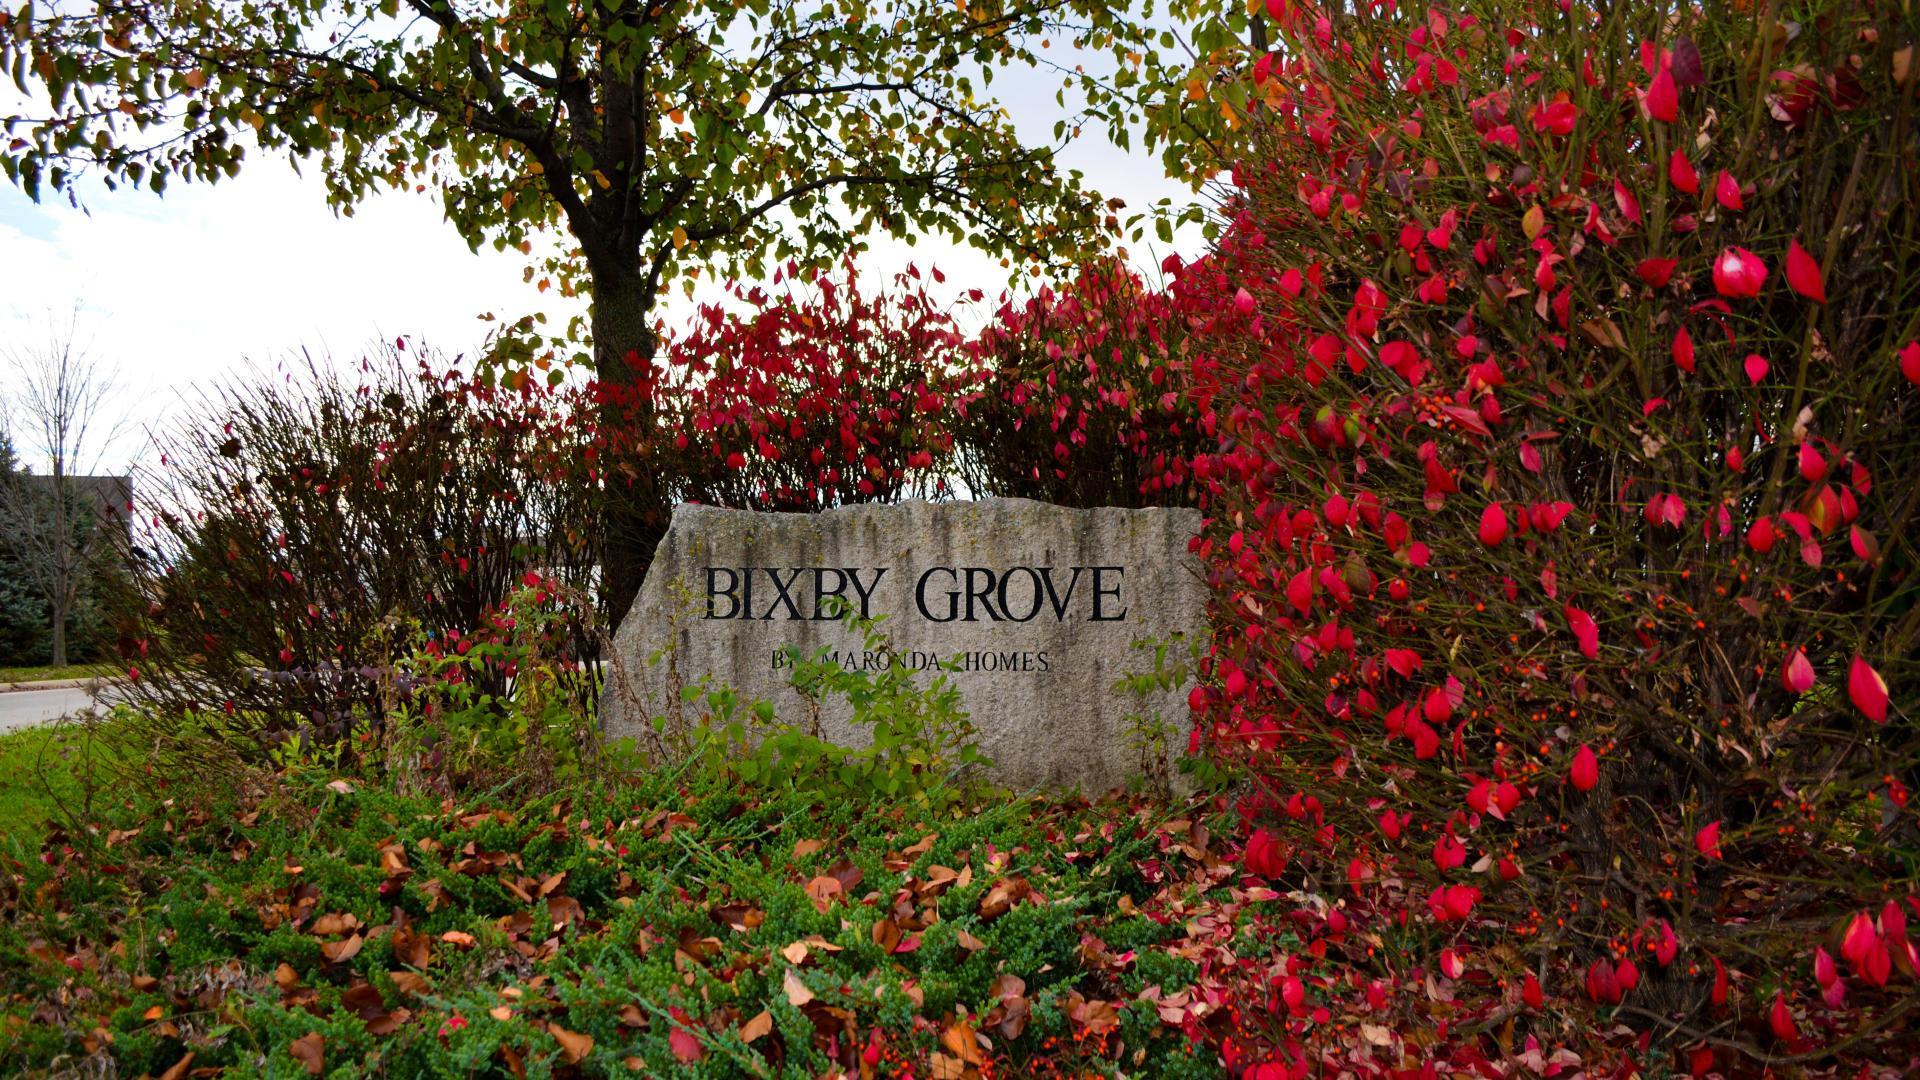 'Bixby Grove' by Maronda - Columbus South in Columbus